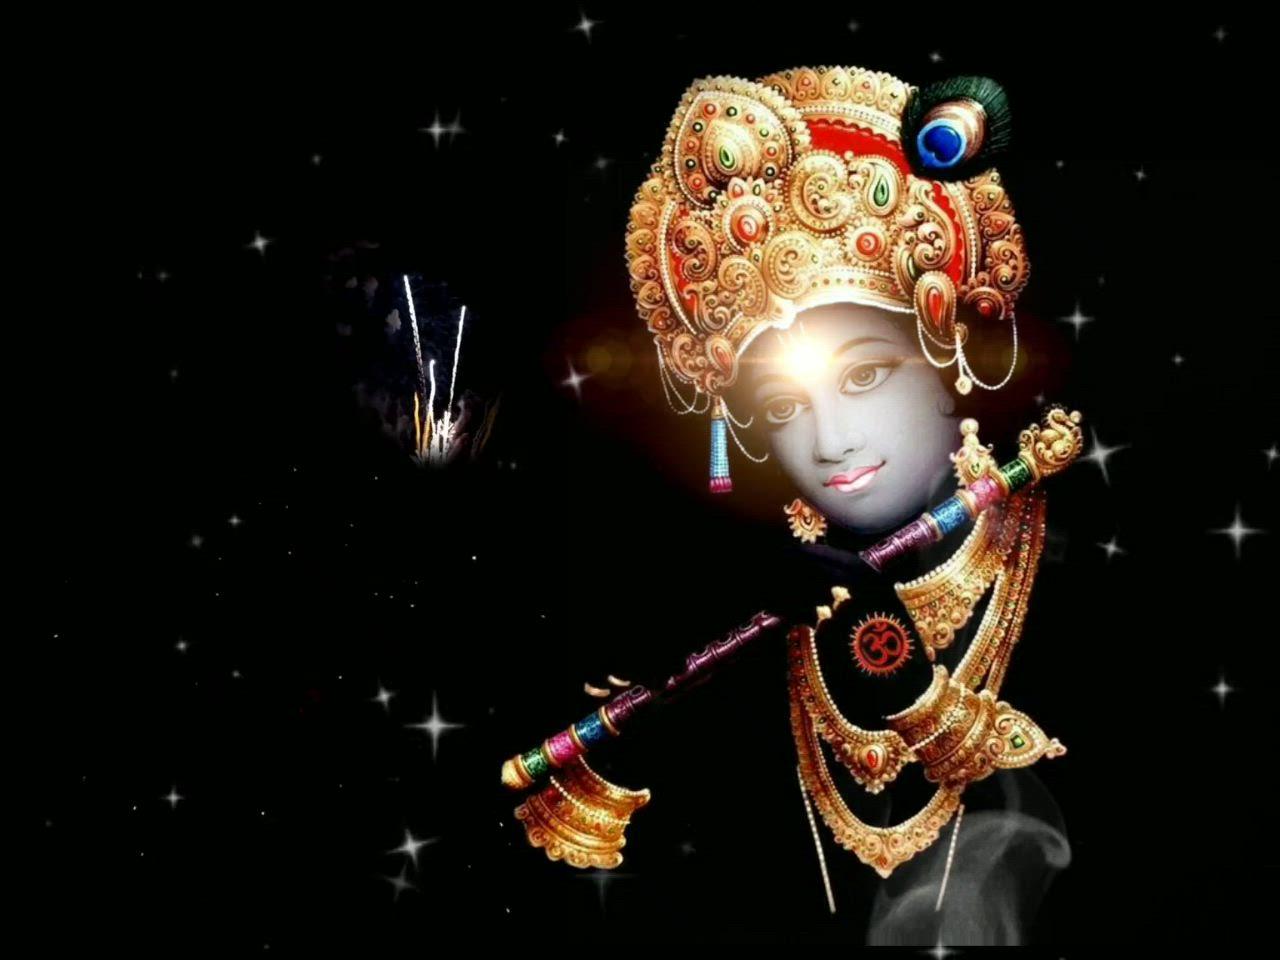 Krishna Live Wallpapers Video In 2021 Krishna Radha Painting Lord Krishna Images Live Wallpapers